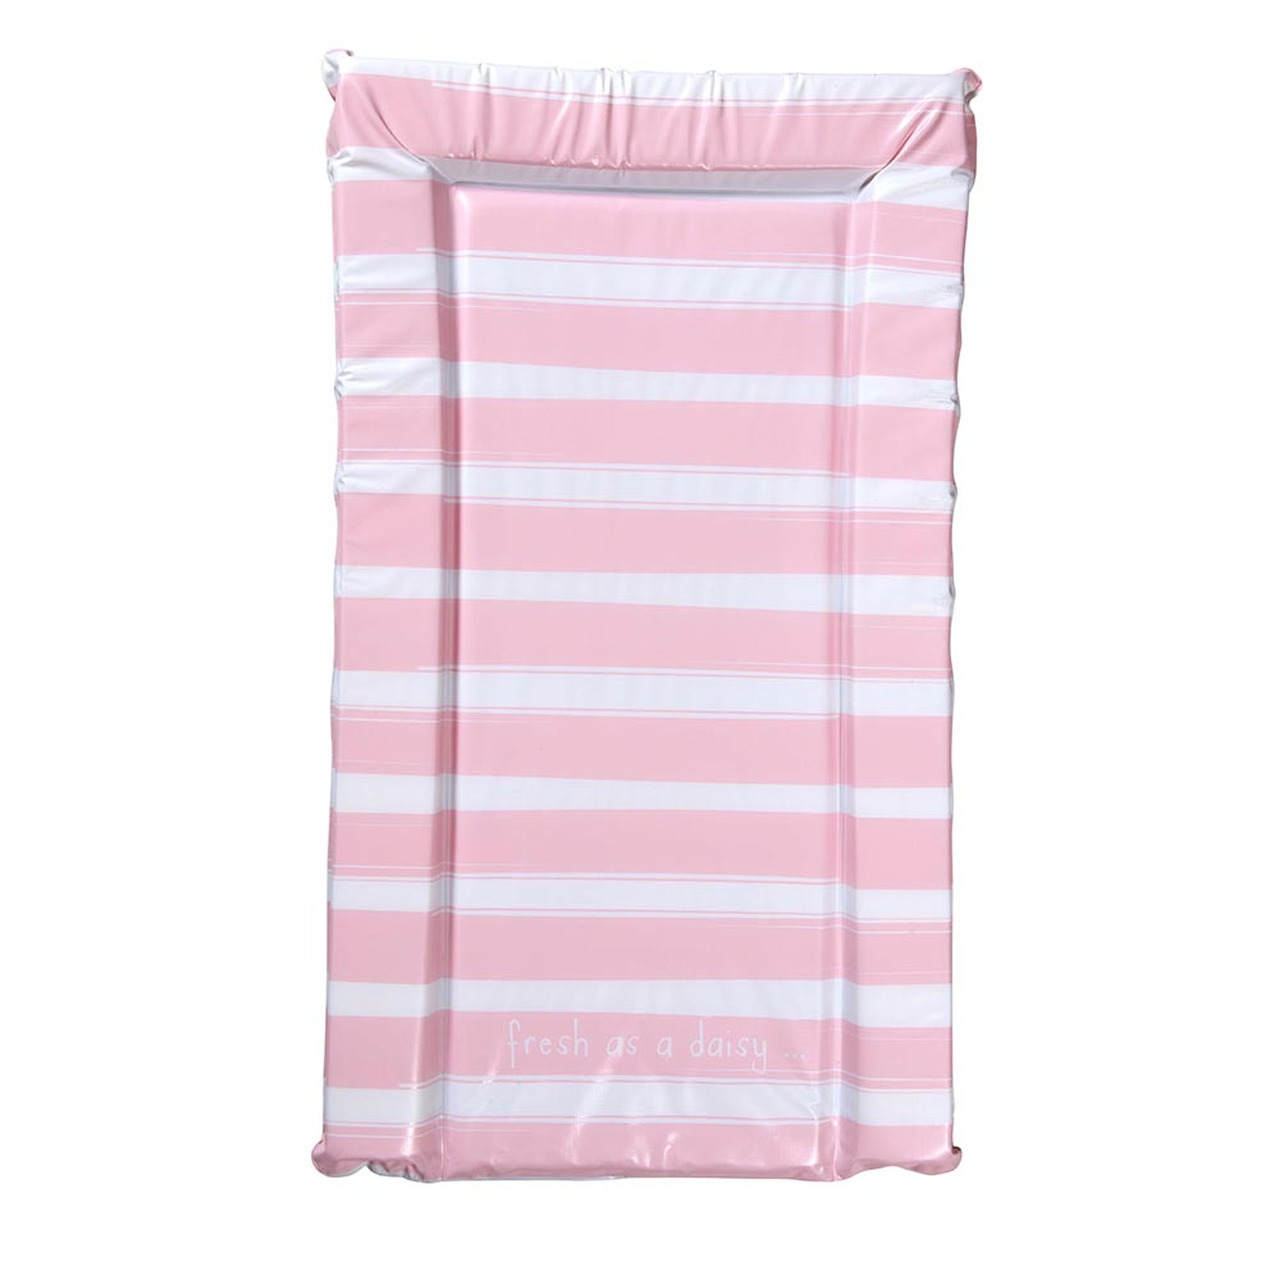 Pink Changing Mat - Fresh As A Daisy